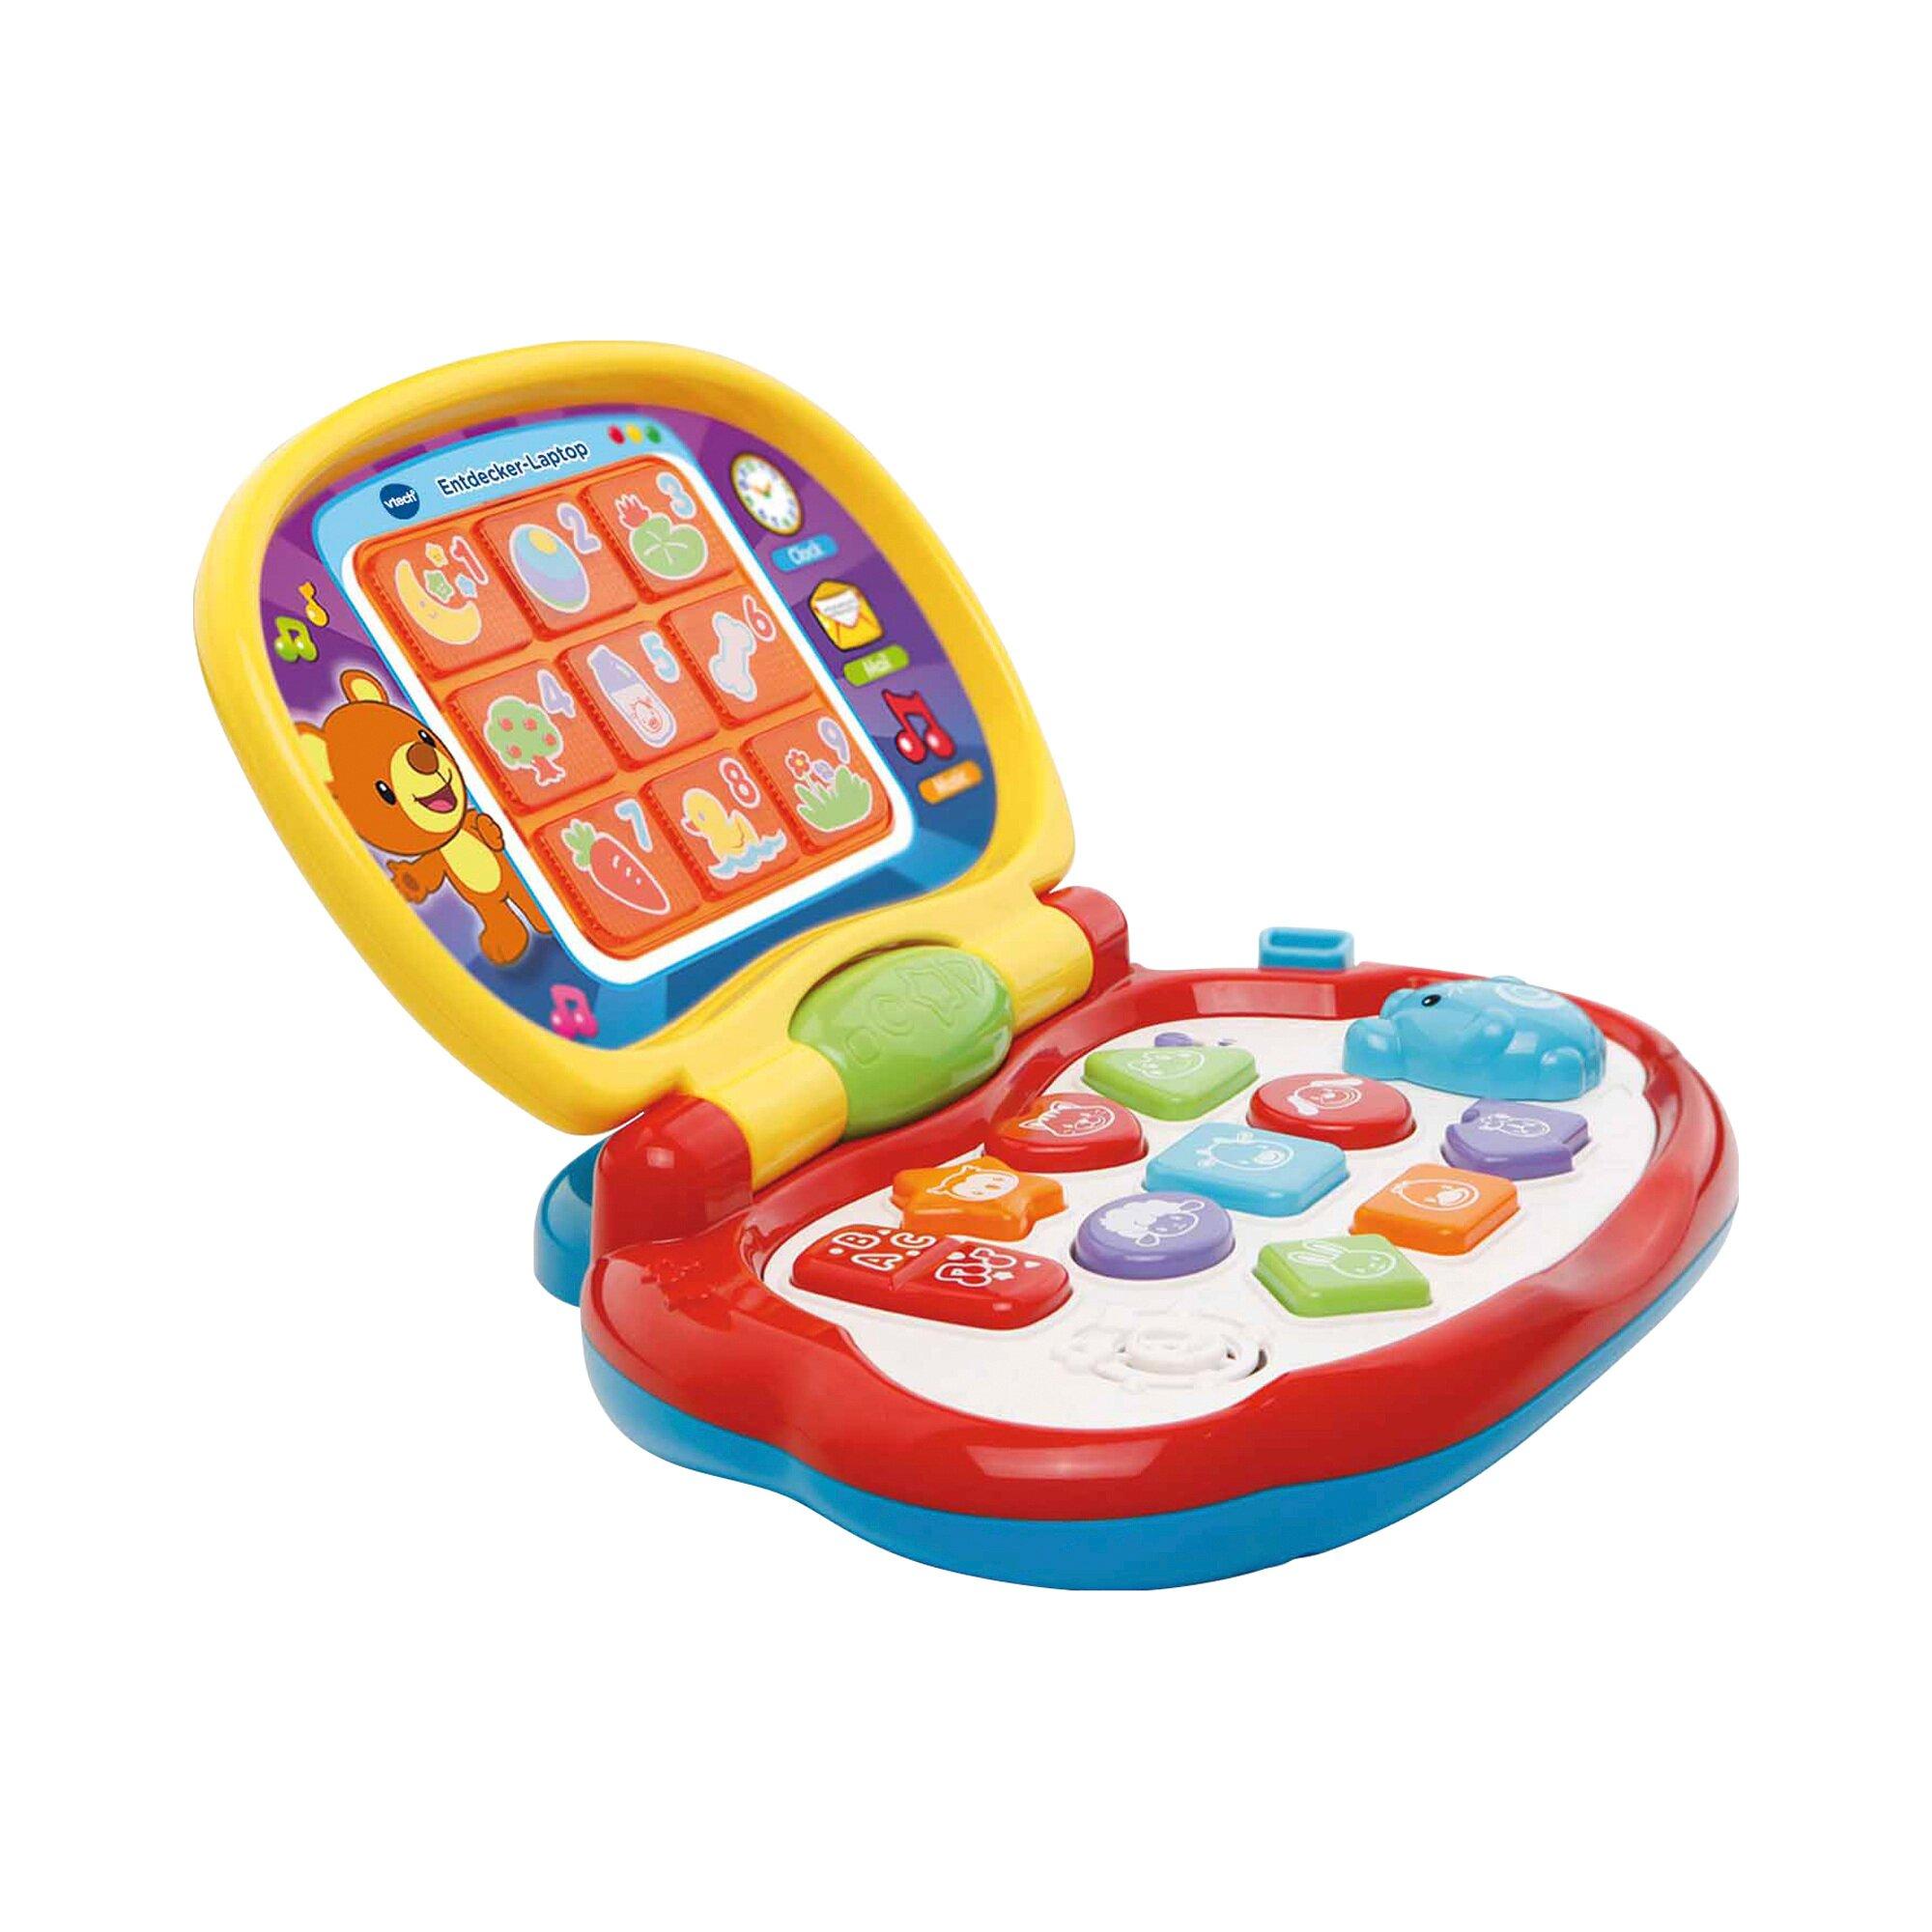 baby-entdecker-laptop, 19.99 EUR @ babywalz-de